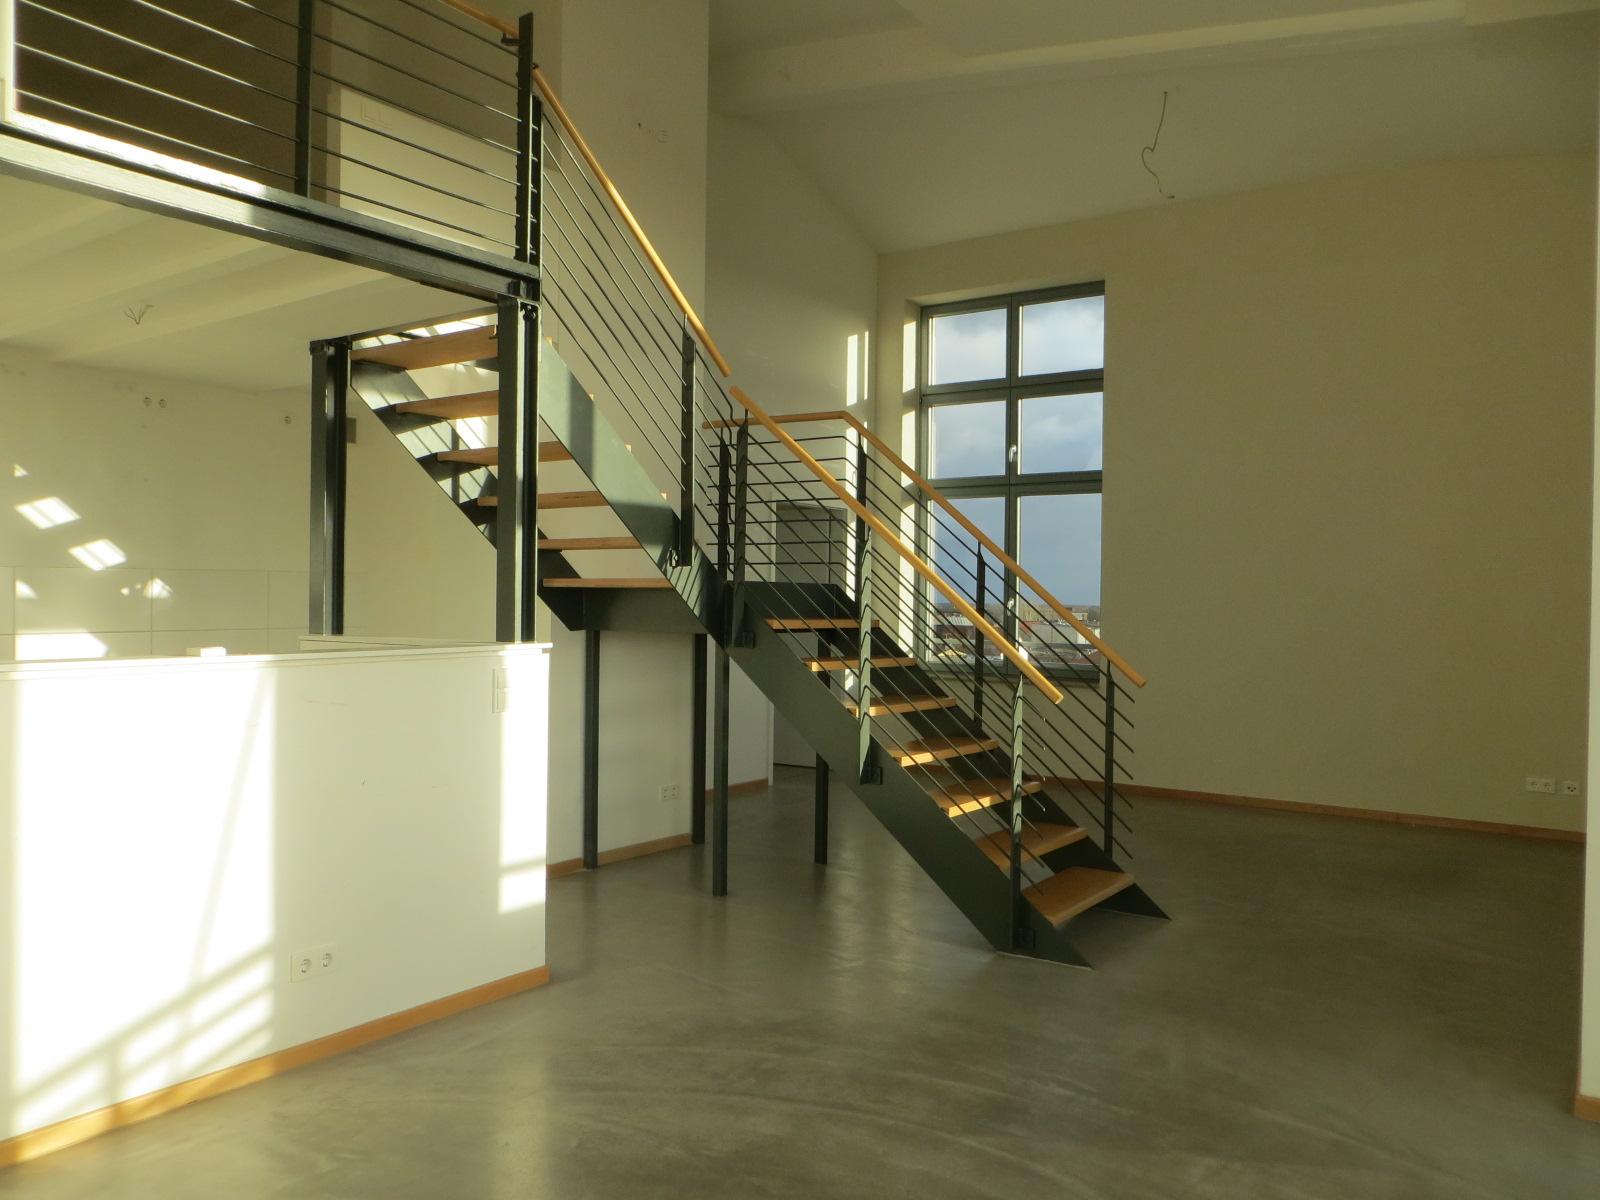 Atelier Räume in Magdeburg